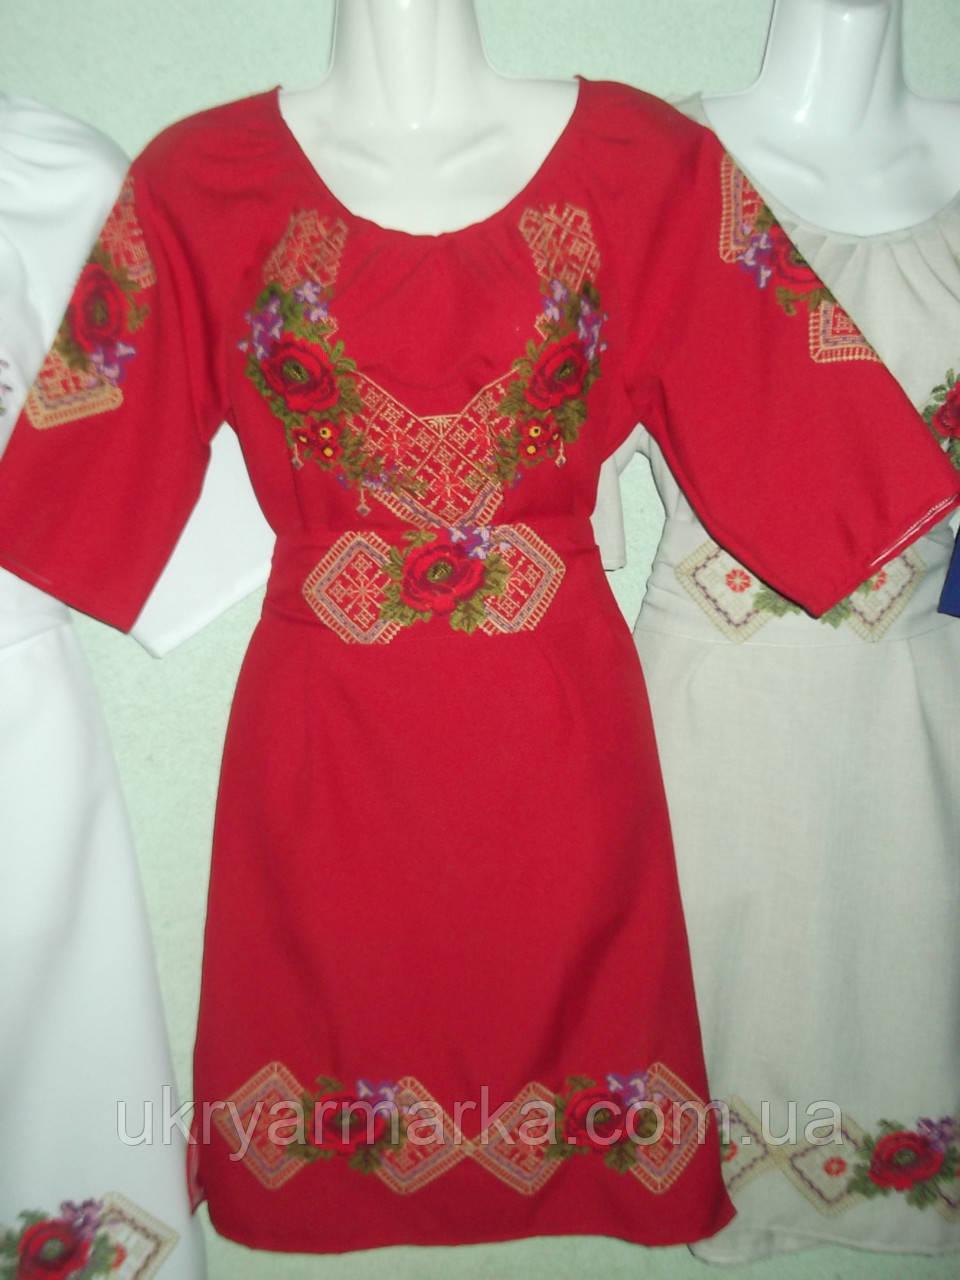 5c84d785c90d3c Жіноче вишите плаття